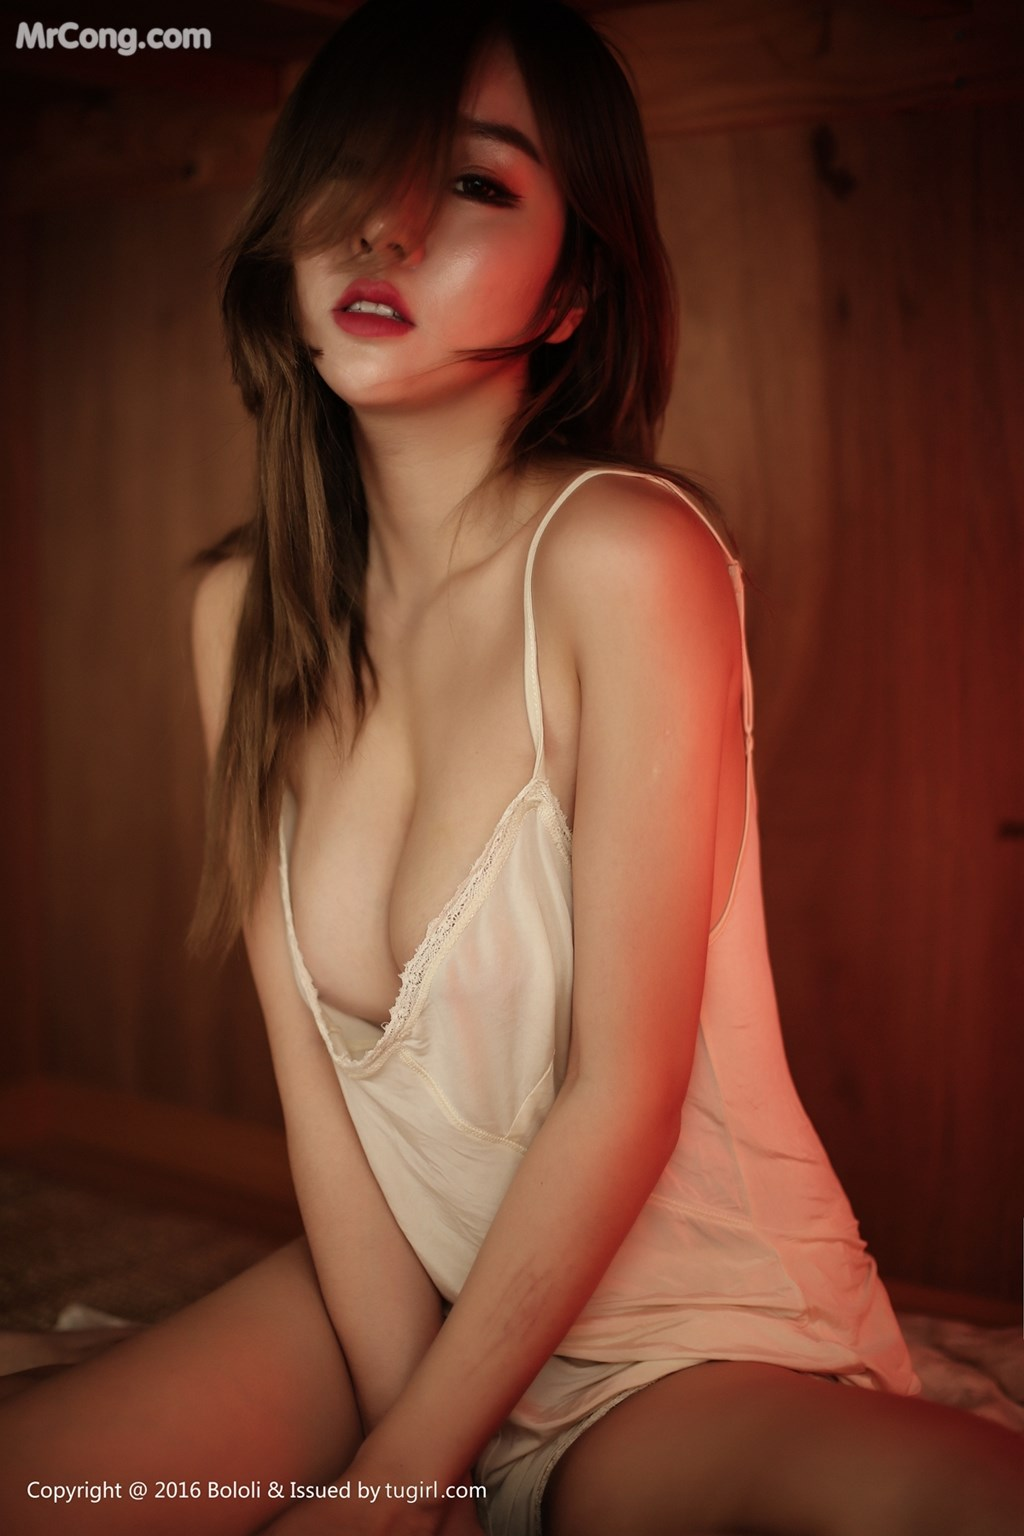 Gambar BoLoli-2017/08/14-Vol.102-Wang-Yu-Chun-MrCong.com-024 di BoLoli posting 2017/08/14 Vol.102: Model Wang Yu Chun (王 雨 纯) (49 foto)